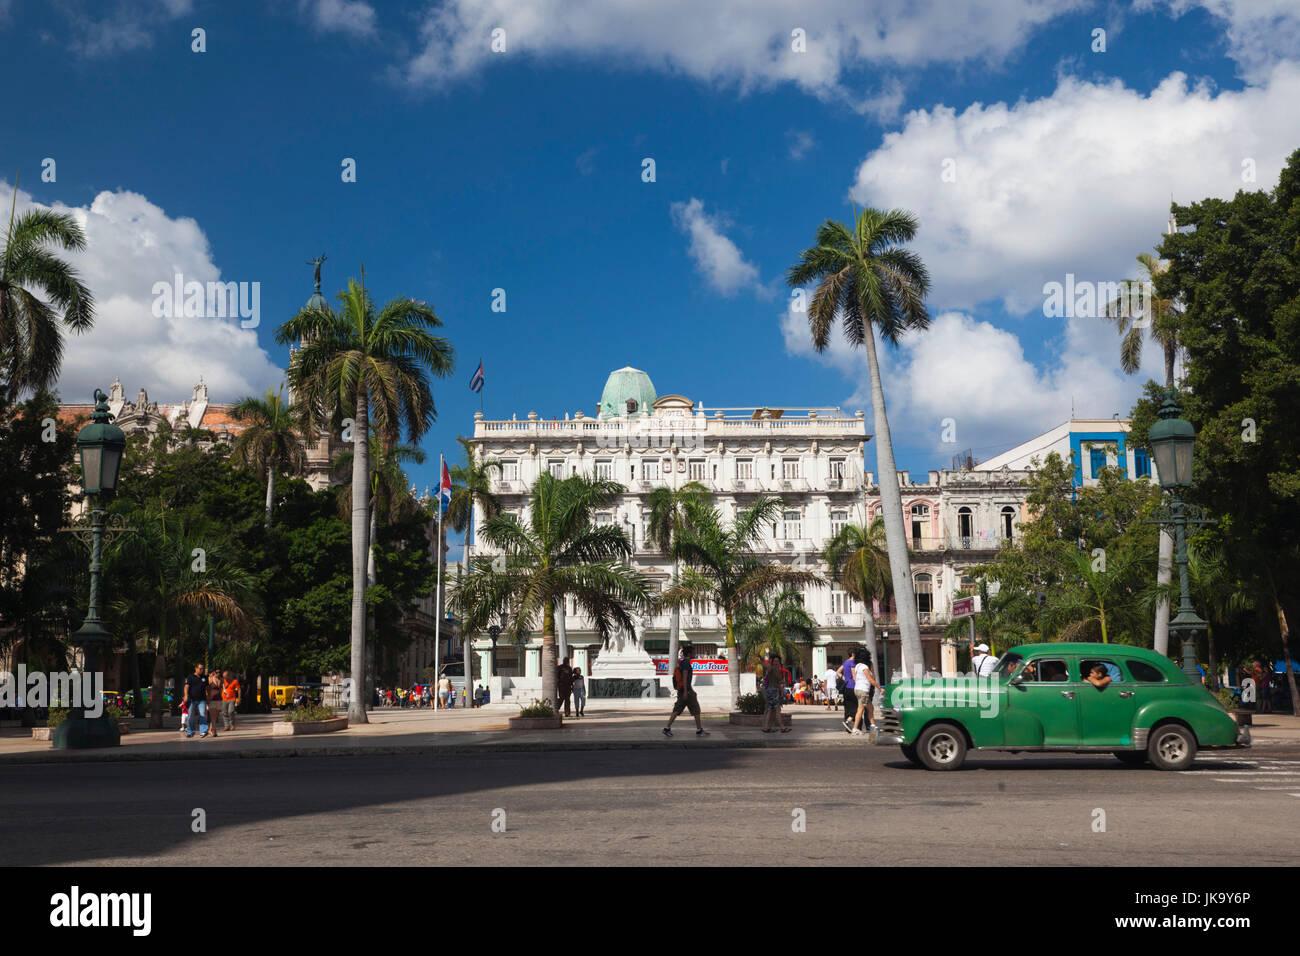 Cuba, Havana, Havana Vieja, the Parque Central and the Hotel Inglaterra - Stock Image